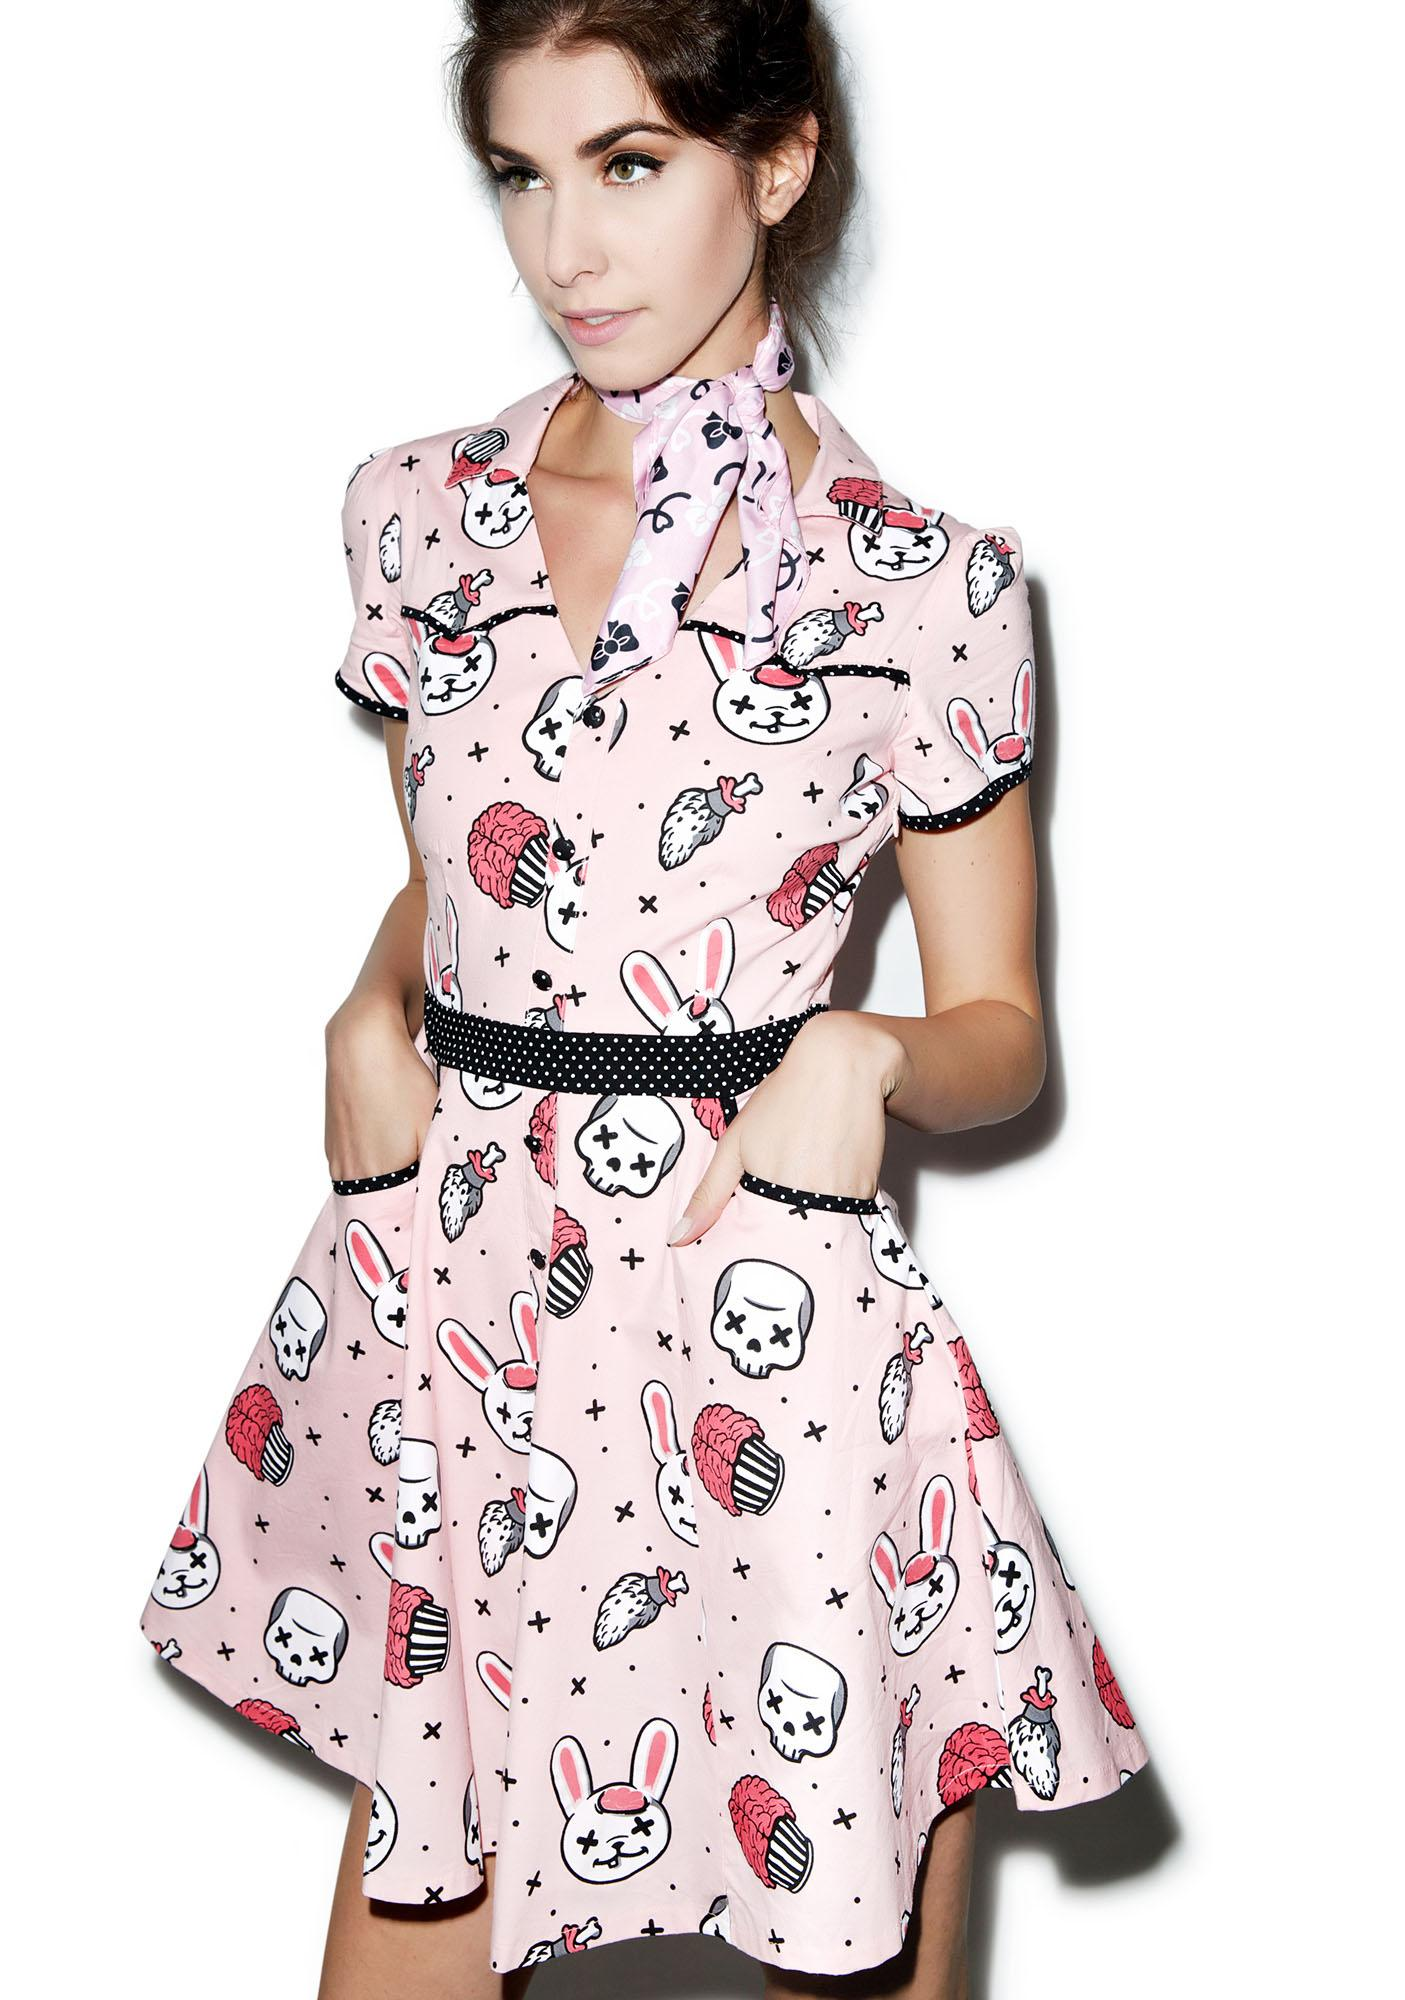 Sourpuss Clothing Hellbilly Zombie Bunnies Dress